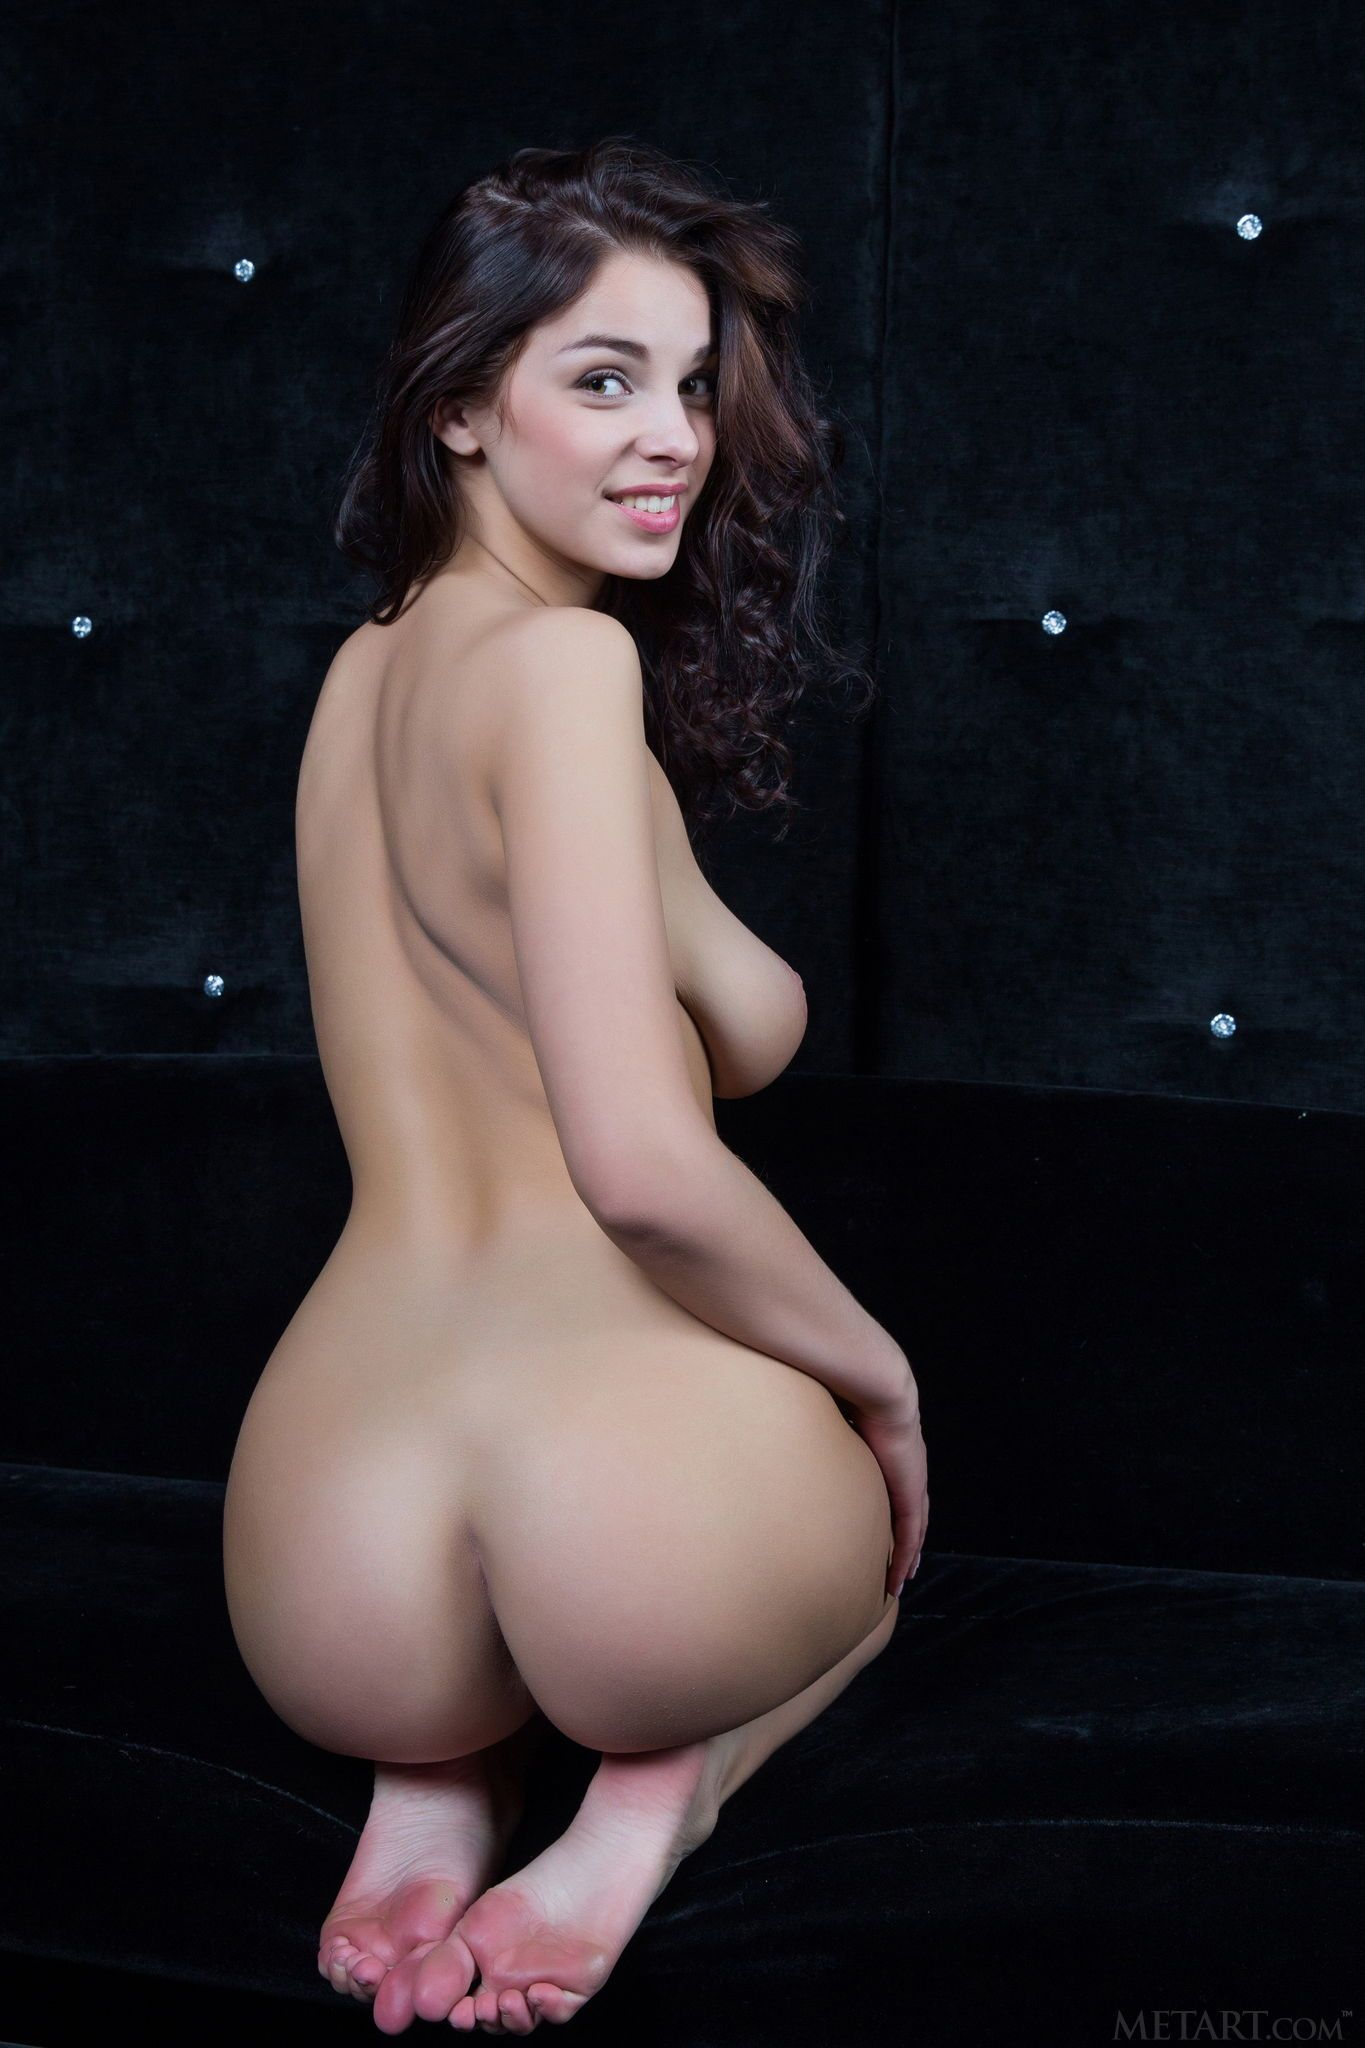 Evita Lima_nude_11